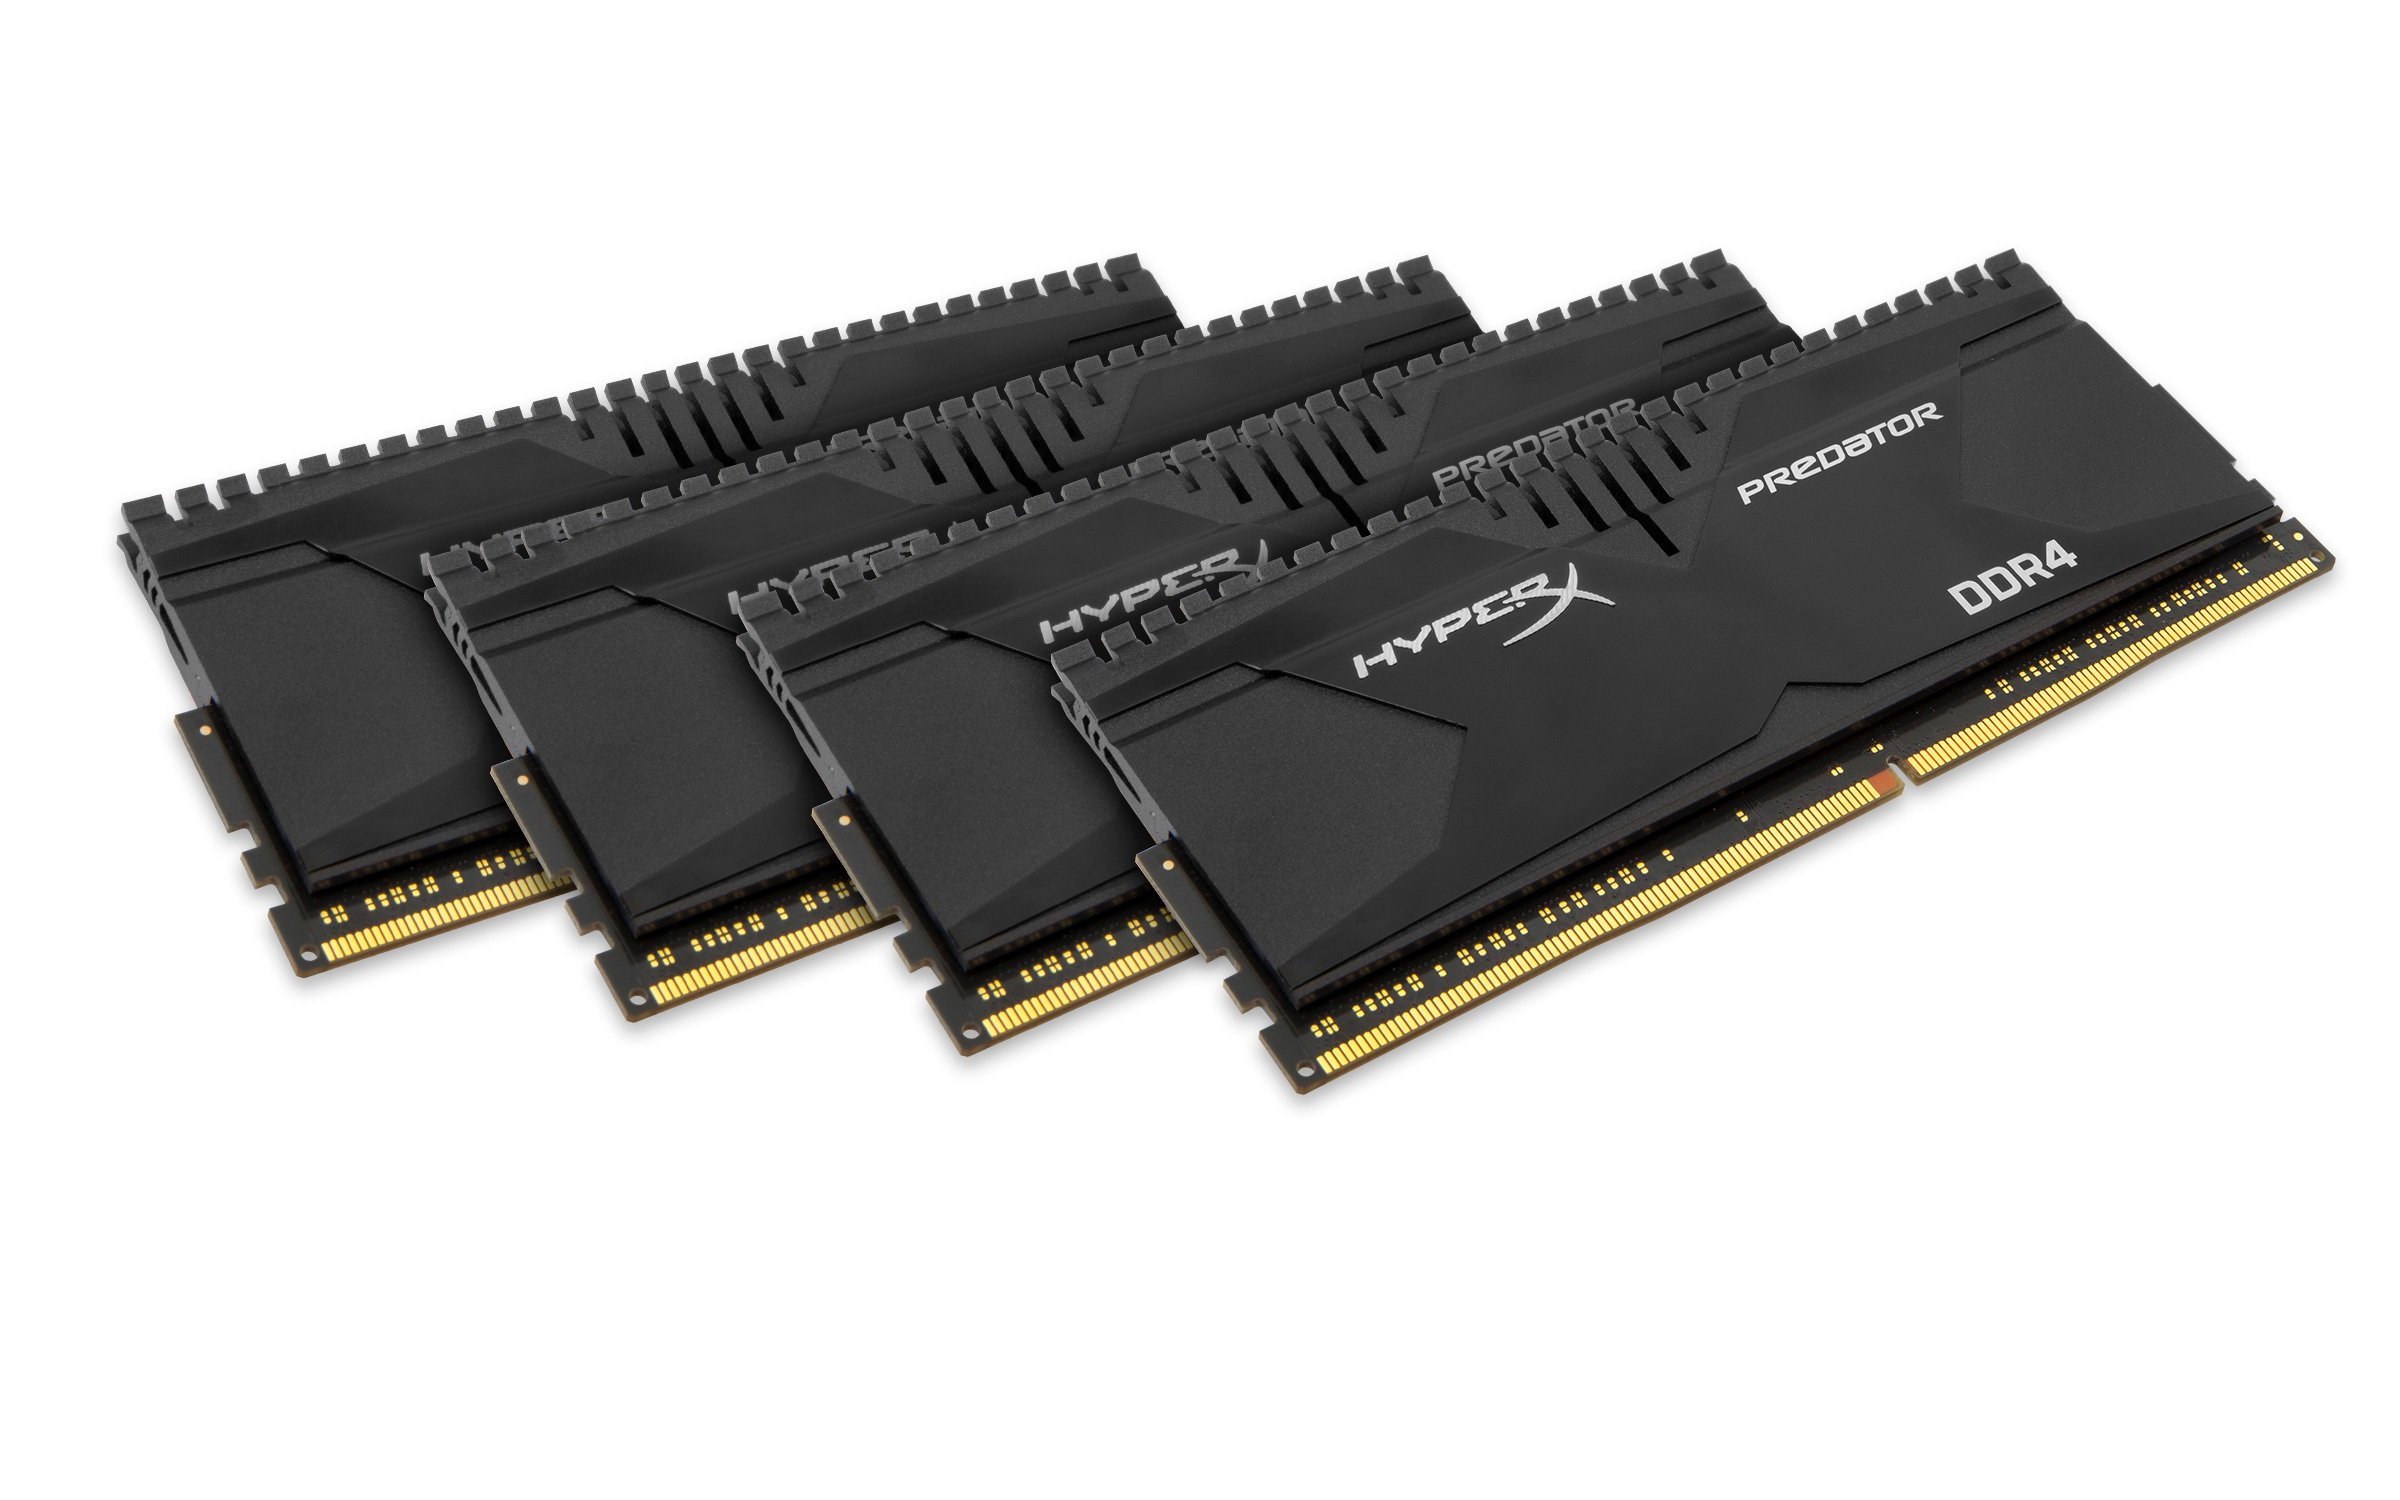 HyperX Predator (T2) 16GB DDR4 2666MHz Kit 16GB DDR4 2666MHz memory module